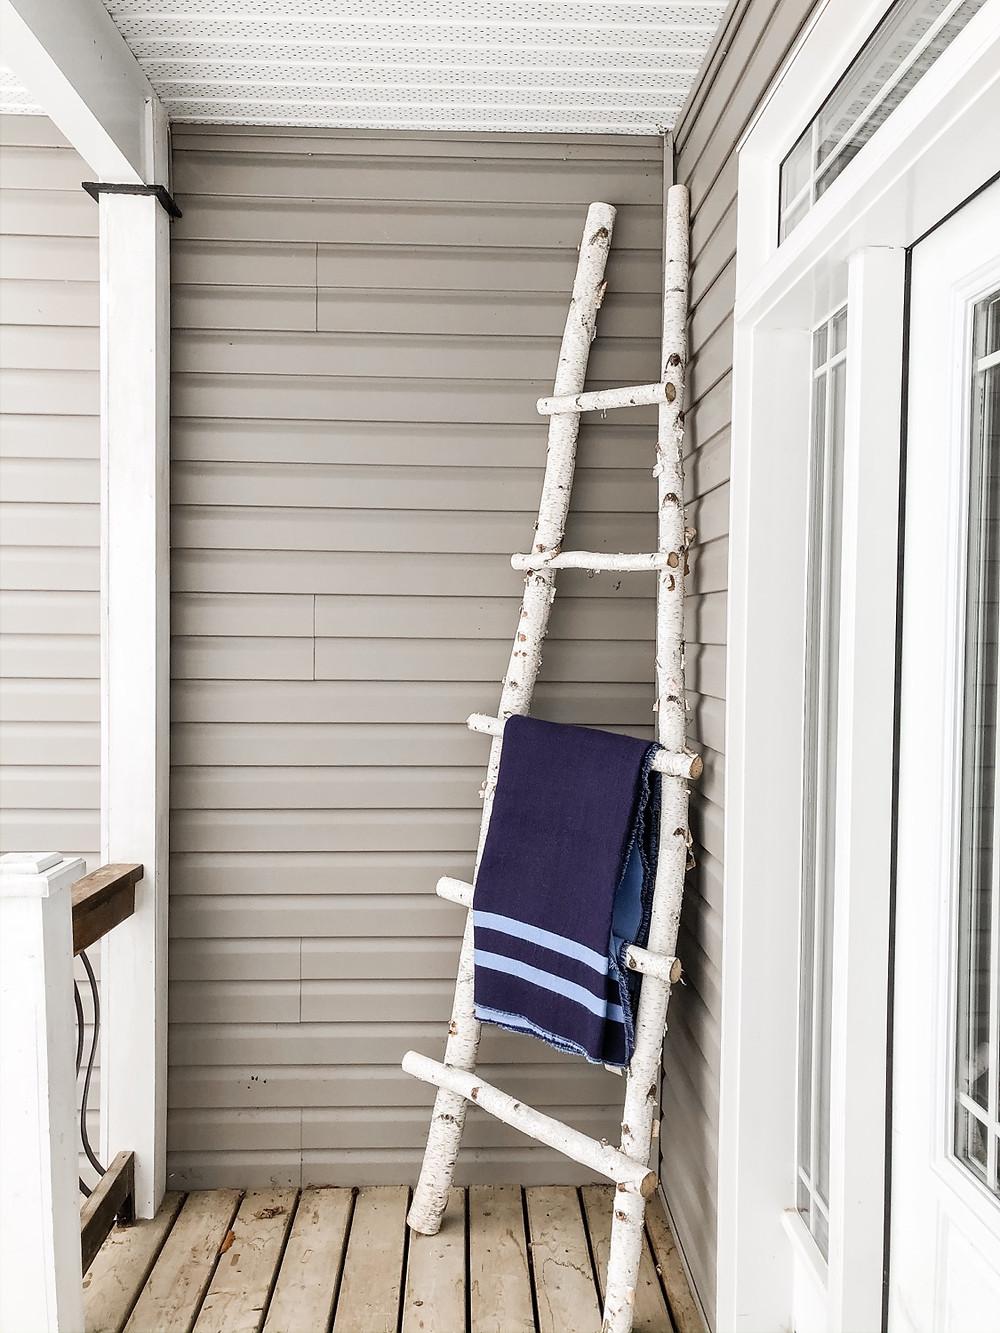 birchwood porch ladder